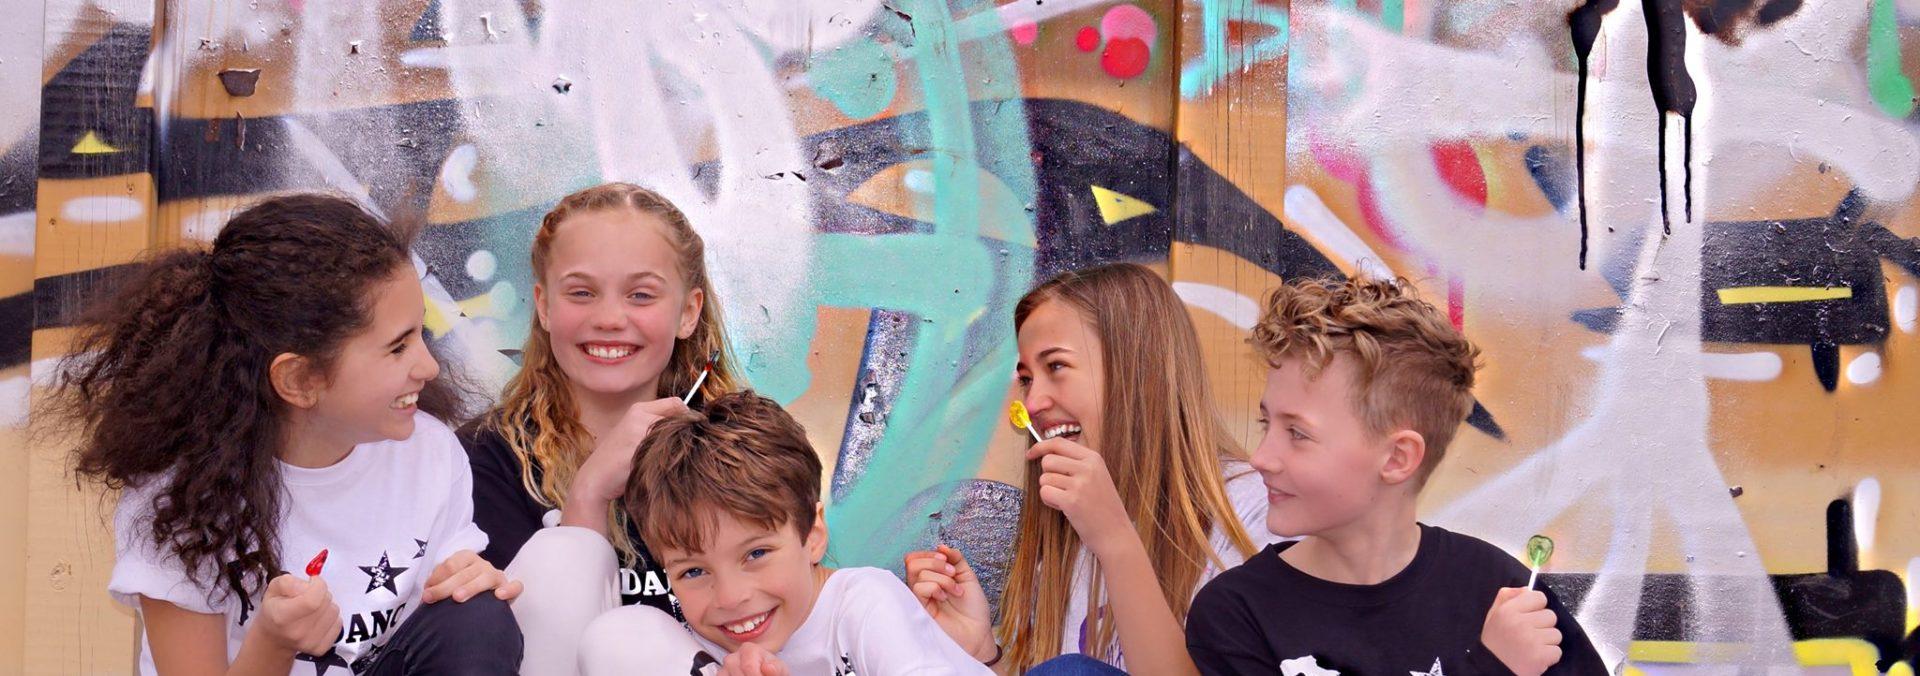 MFK DANCE – Danseskole Albertslund Roskildevej